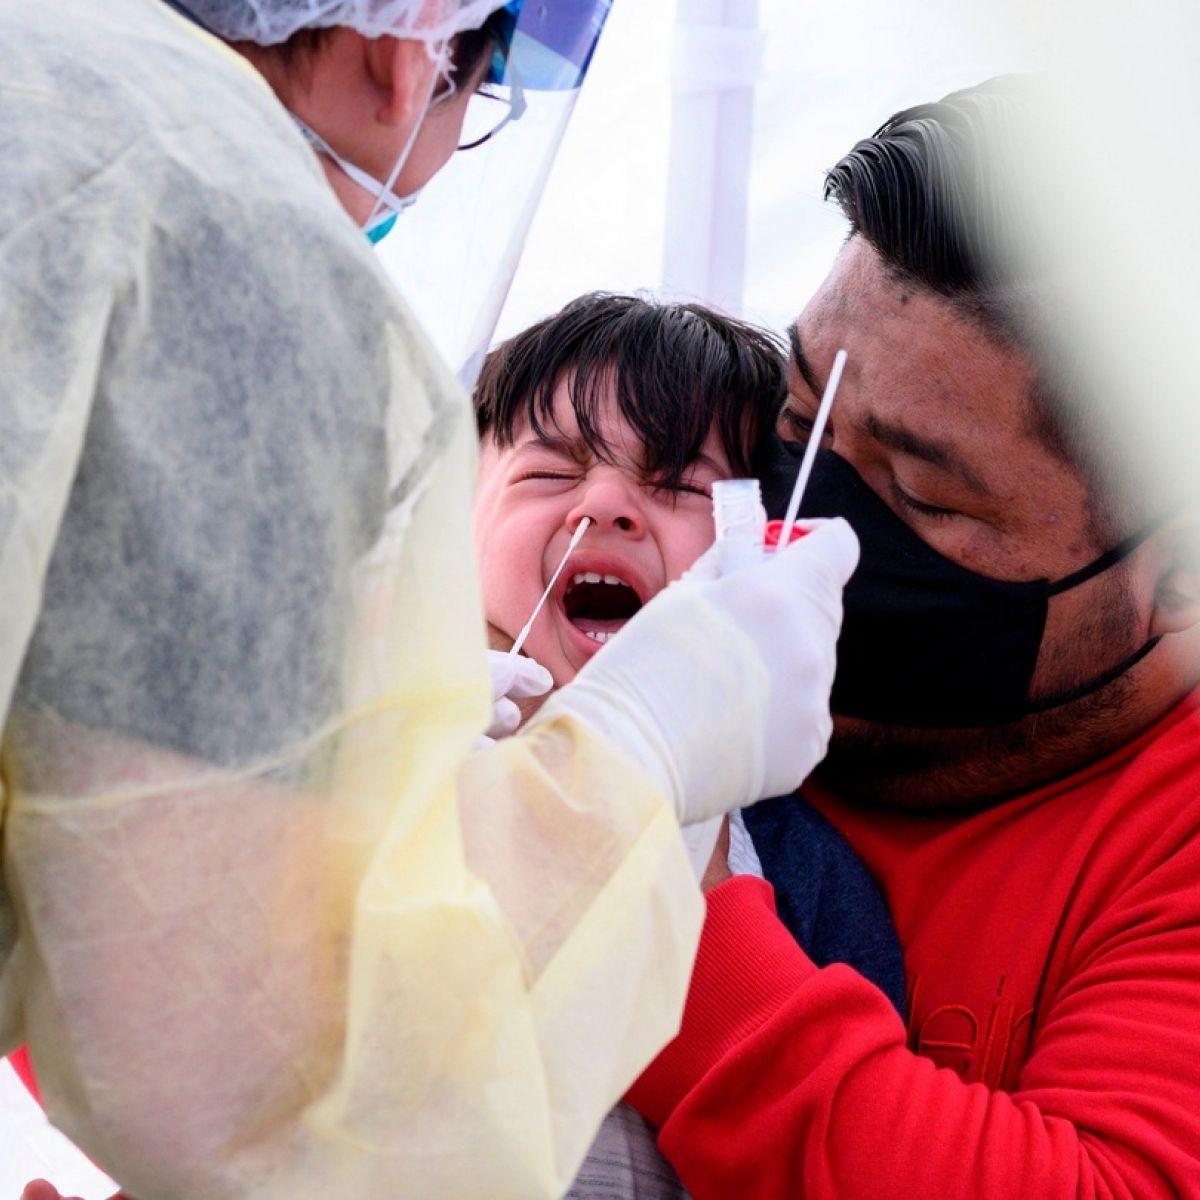 Experts examine less invasive Covid-19 testing for children